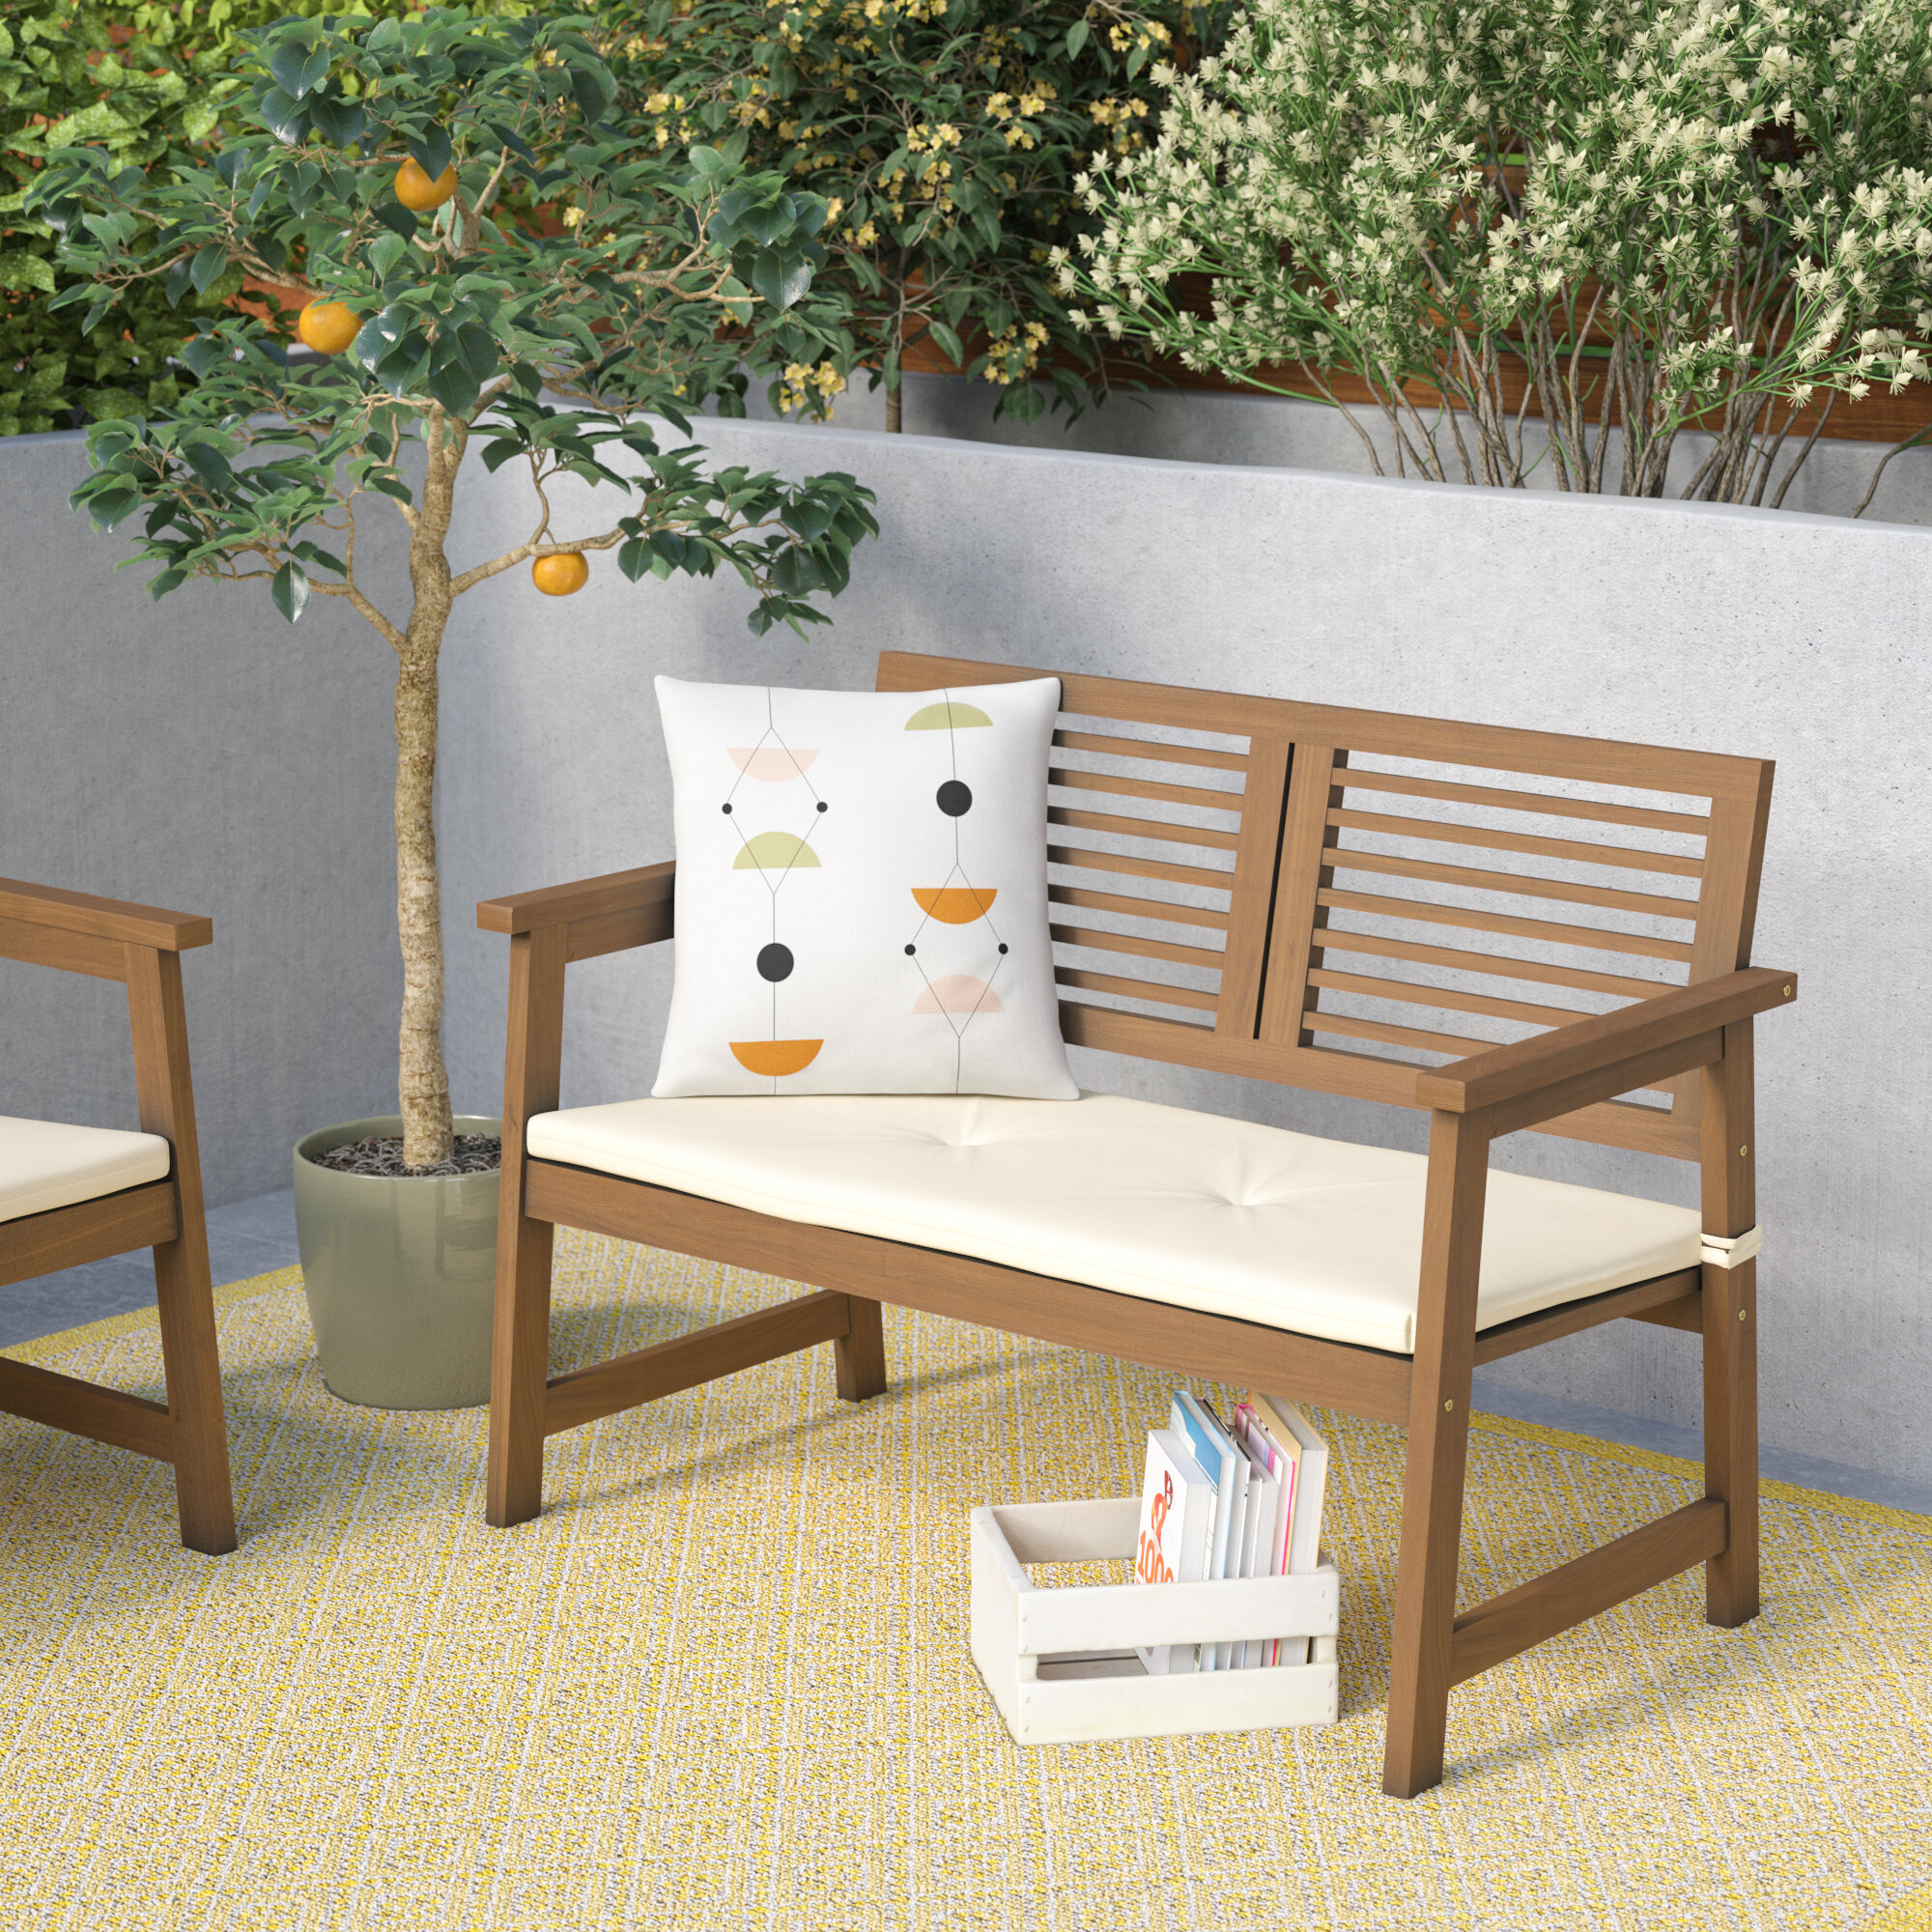 Prime Arianna Meranti Wooden Garden Bench Alphanode Cool Chair Designs And Ideas Alphanodeonline